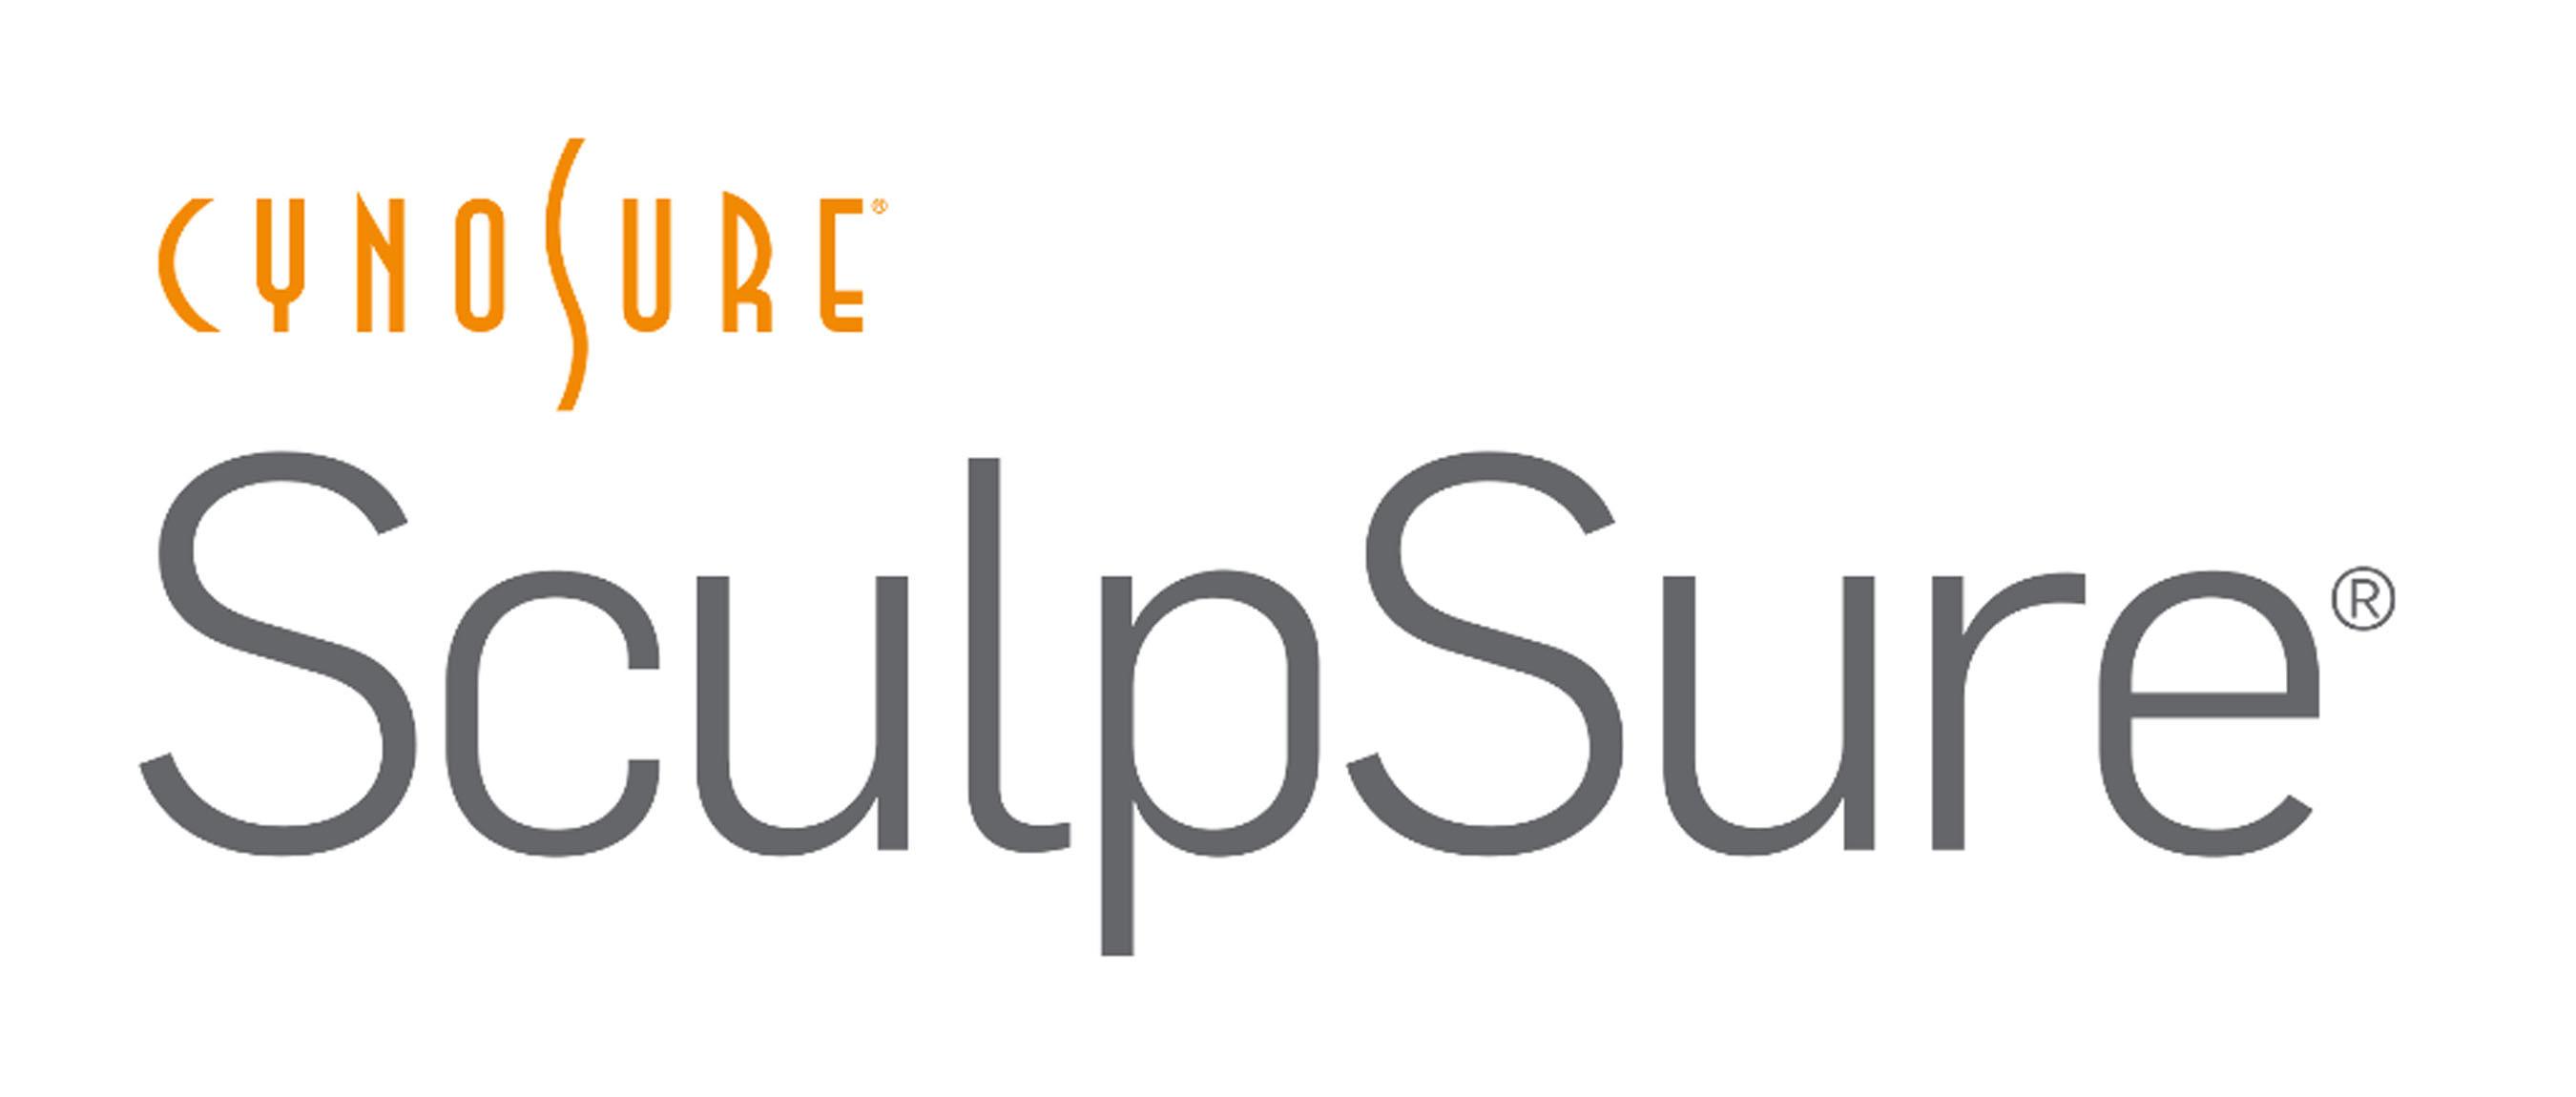 Cynosure SculpSure